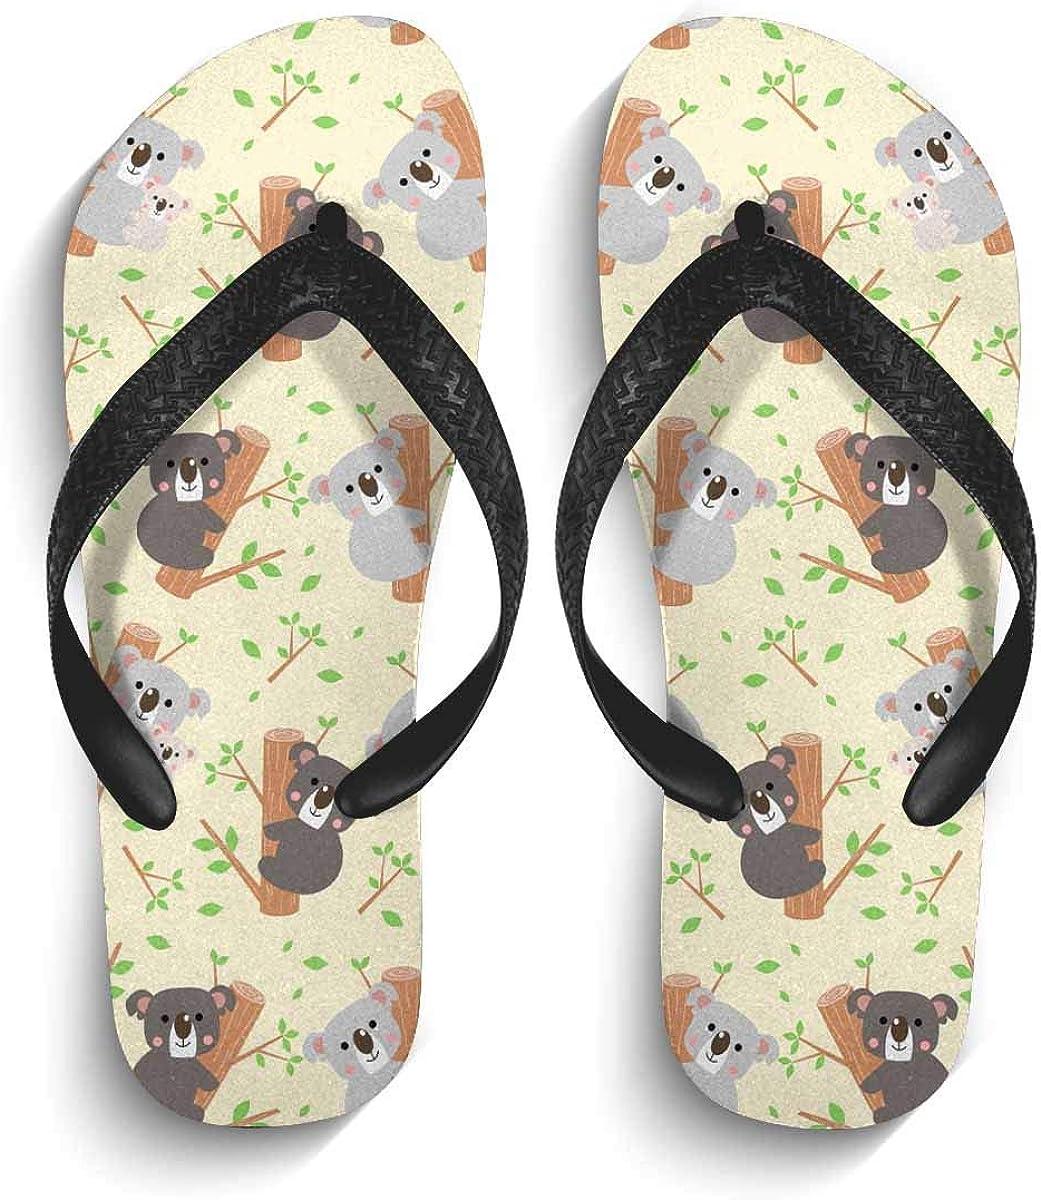 InterestPrint Men's Non-Slip Flip Flops Cute Koala and Leaves on Yellow Thongs Sandals for Beach Lounging Home M